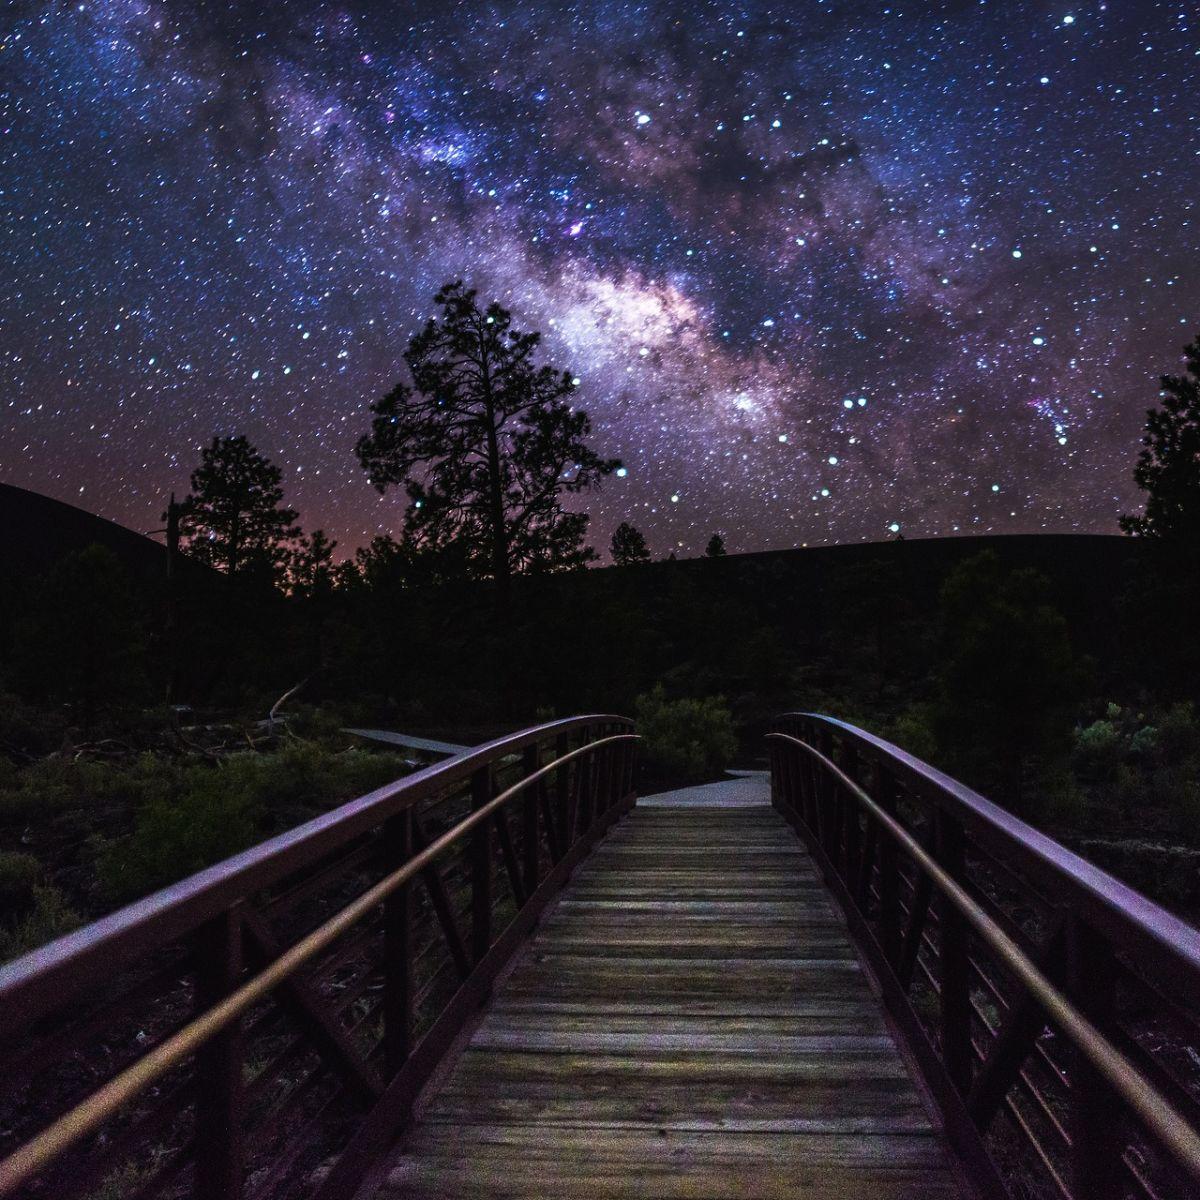 Night landscape, galaxy, milky way, stars, bridge, way, scenic